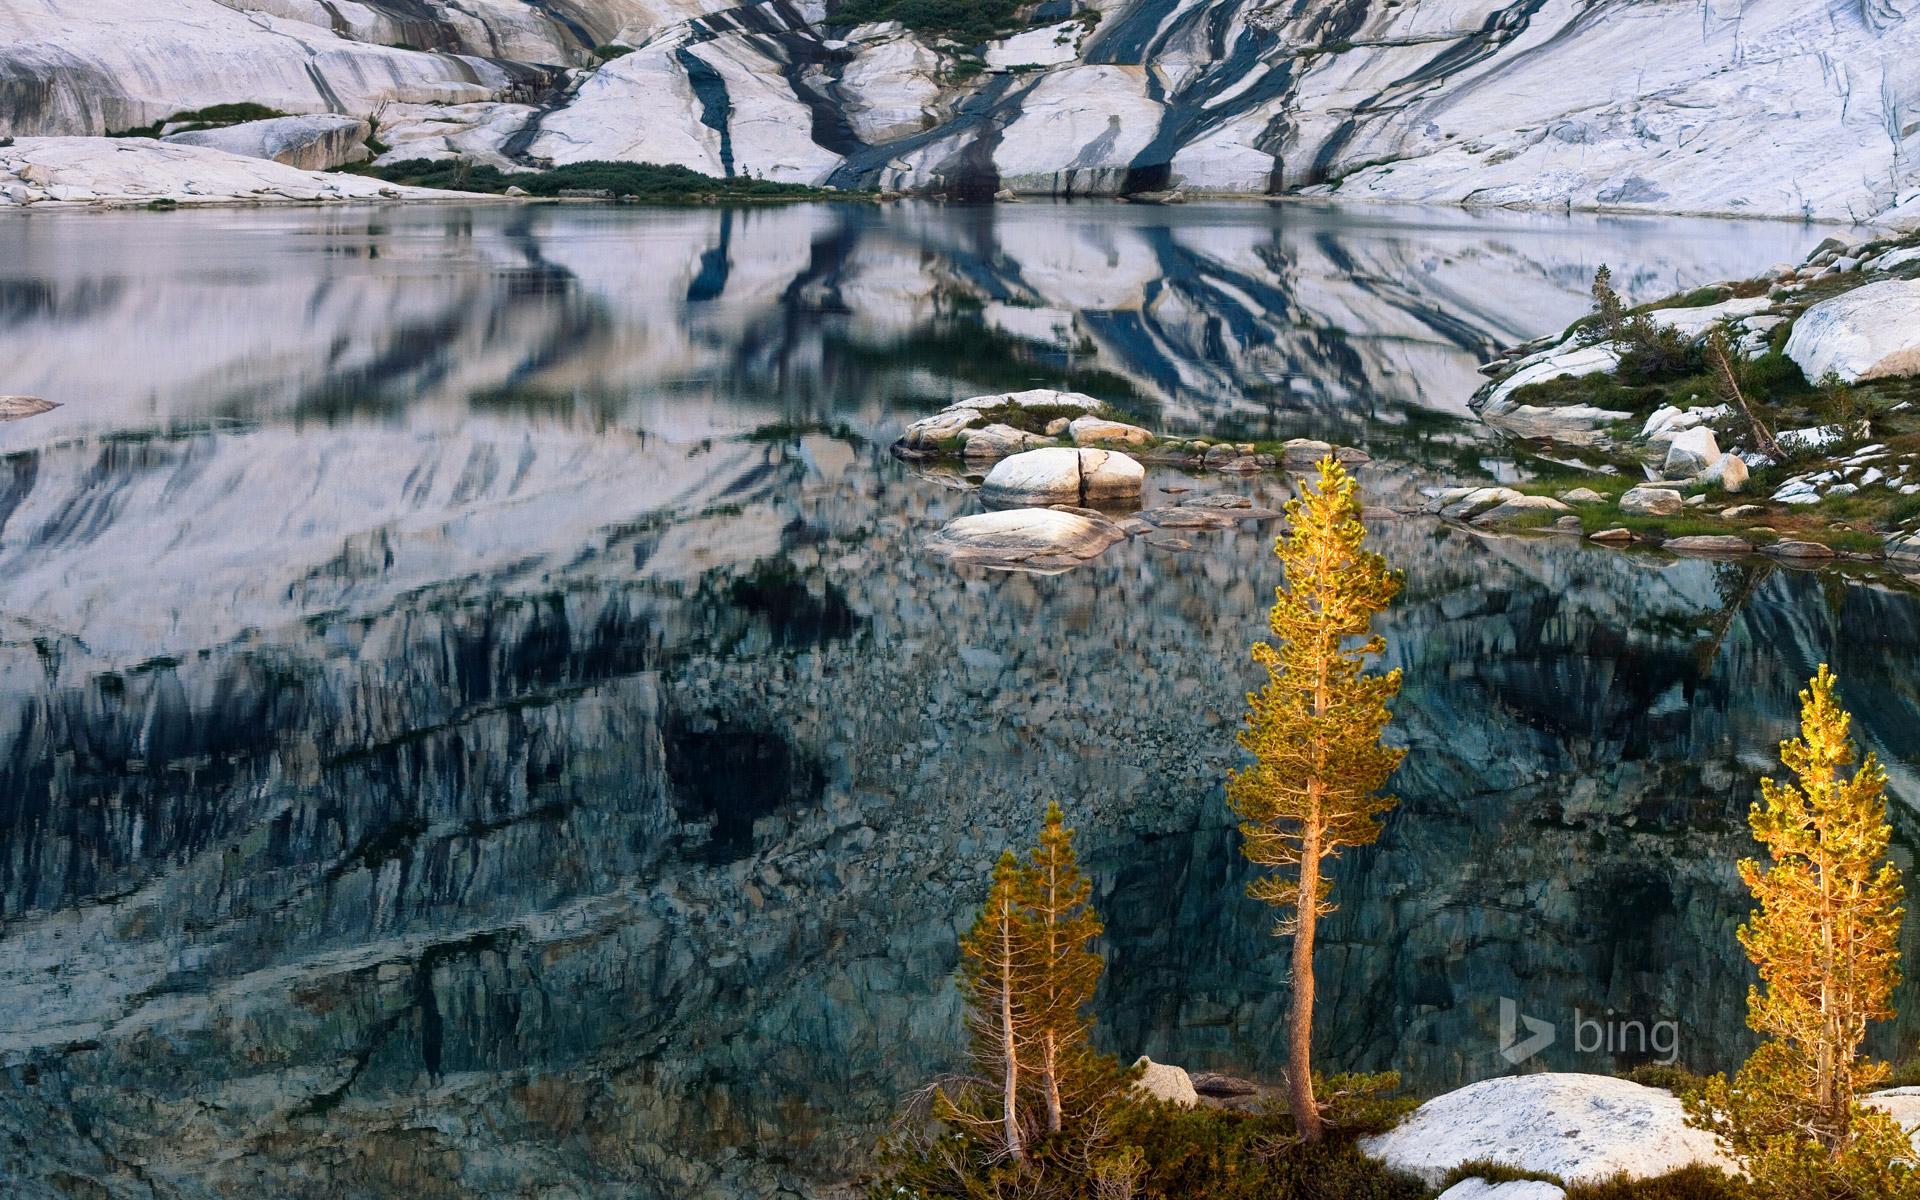 Pear lake sequoia national park california usa lake mountains 1920x1200